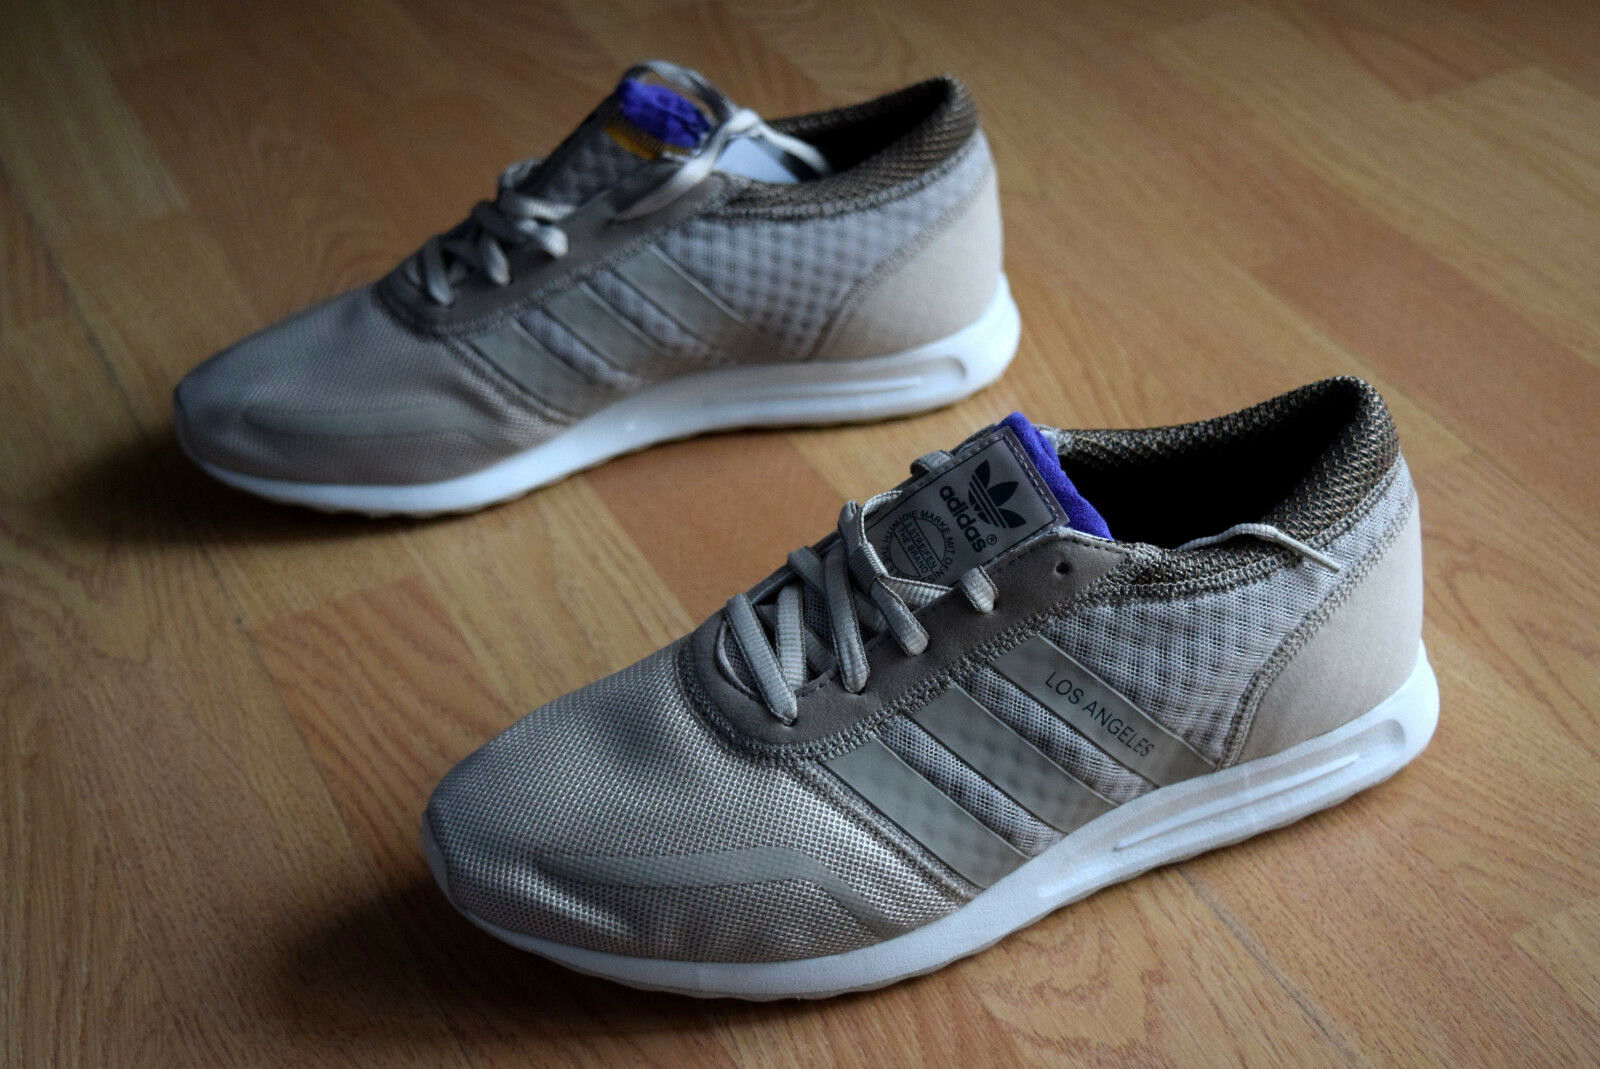 Adidas Los Angeles gr 41 42 43 la 44  AF4191 SL la 43 trAineR country rom zx boston 0c0561